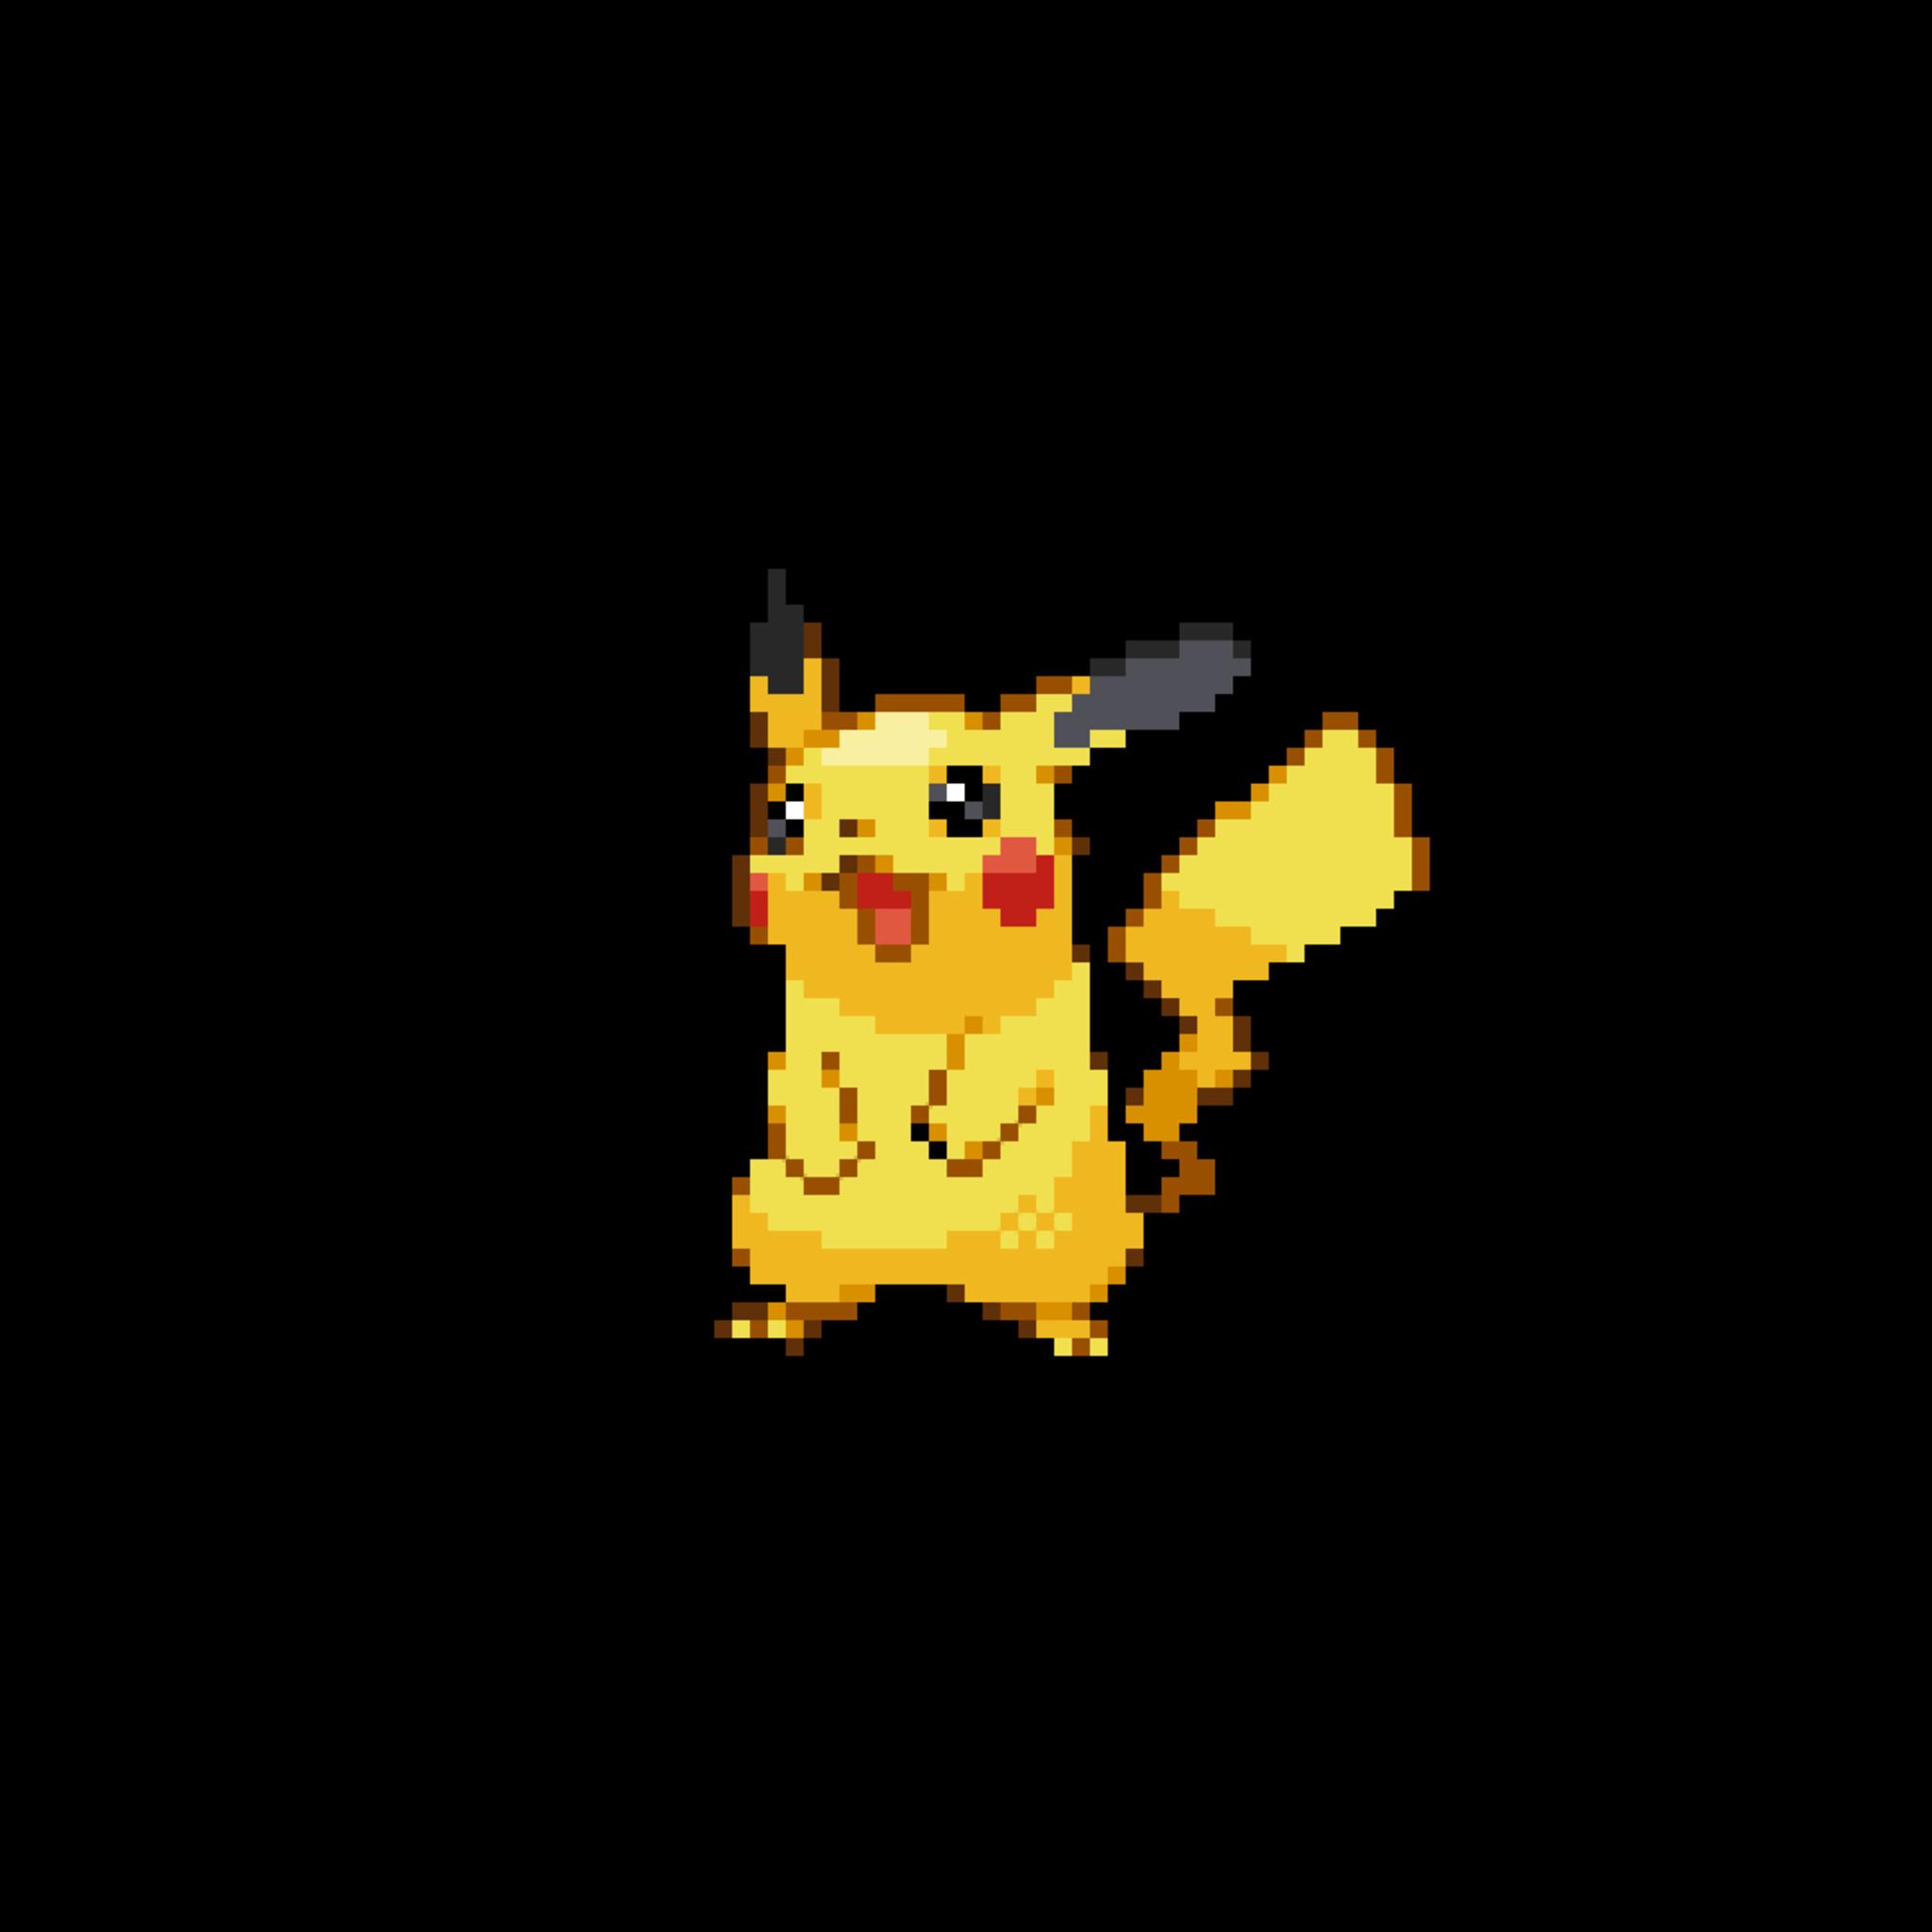 pokemon wallpapers 2048 x 1152 - photo #18